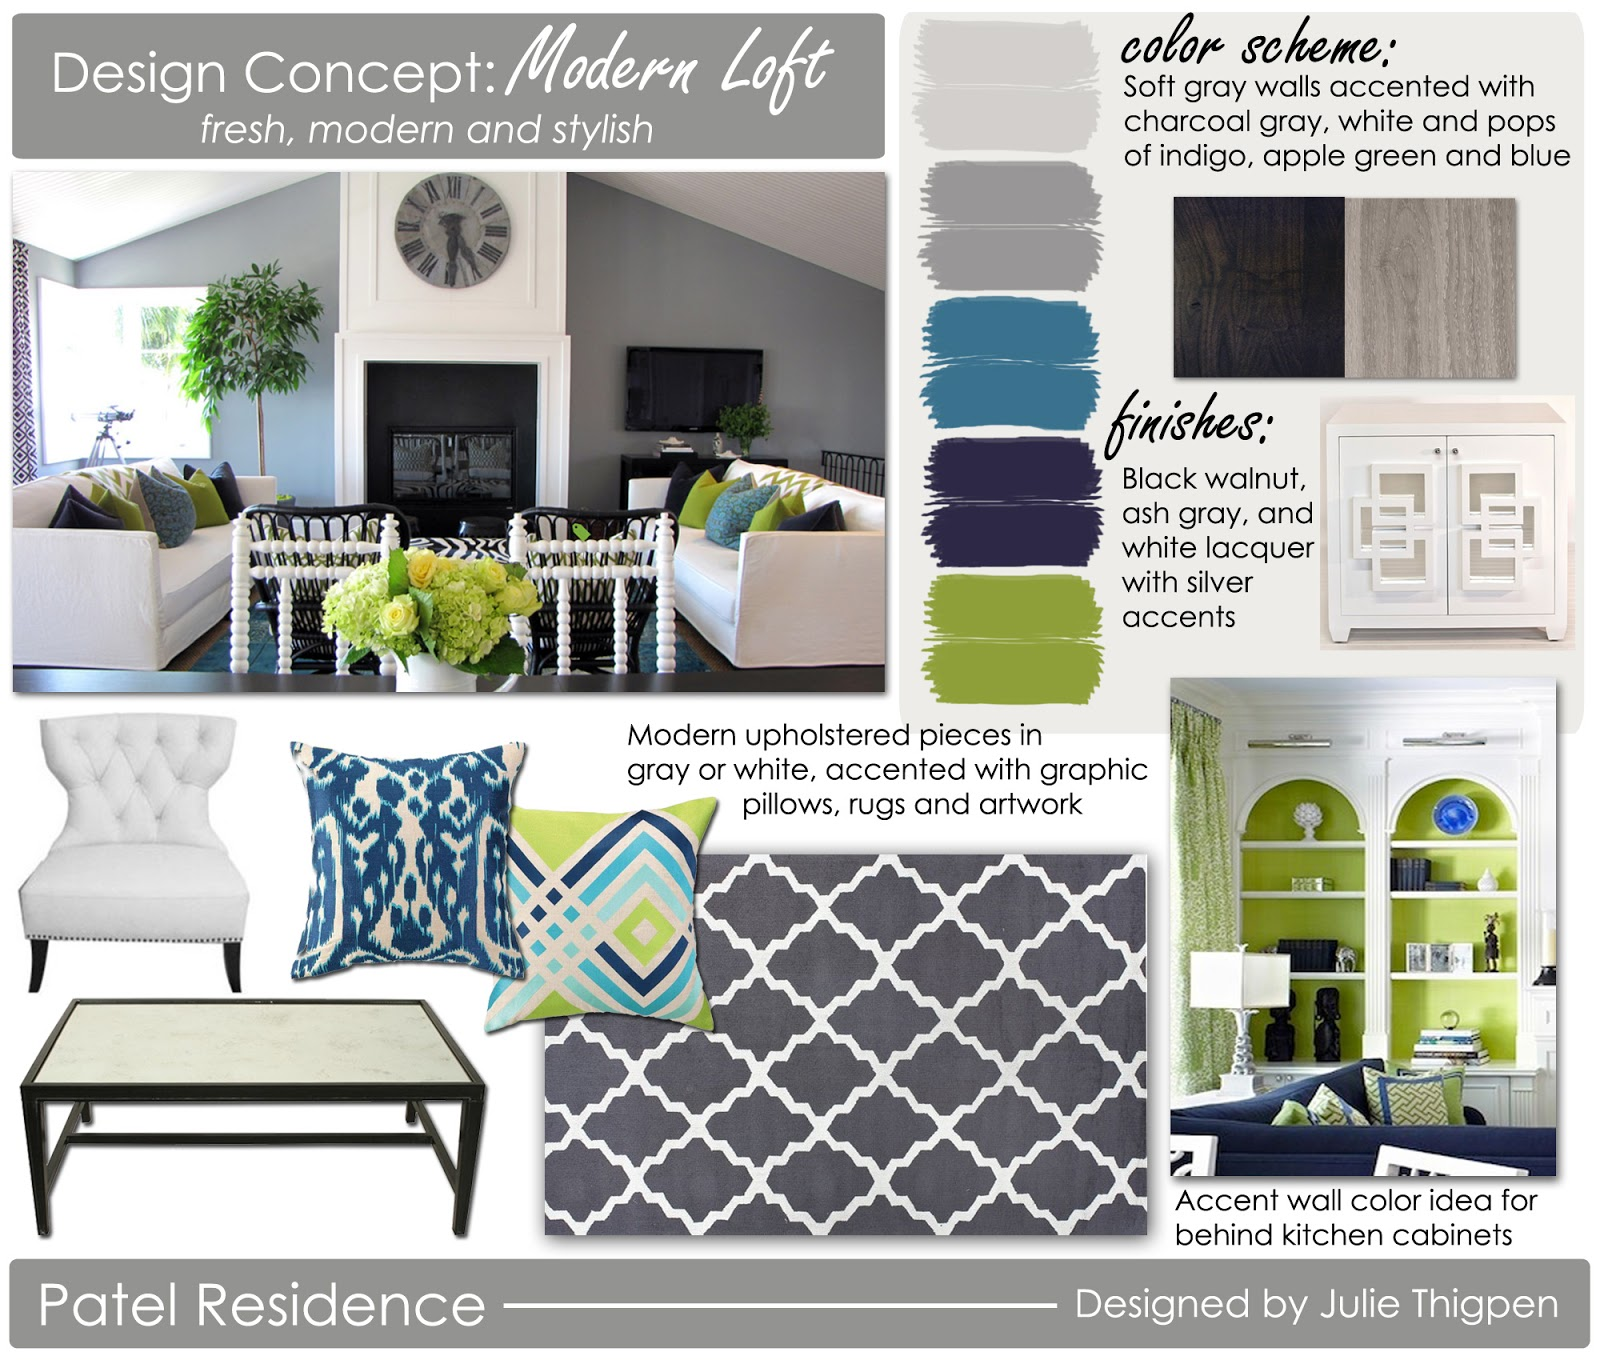 Home Interior Design Concepts: Concept Sheet For Office Interior Design